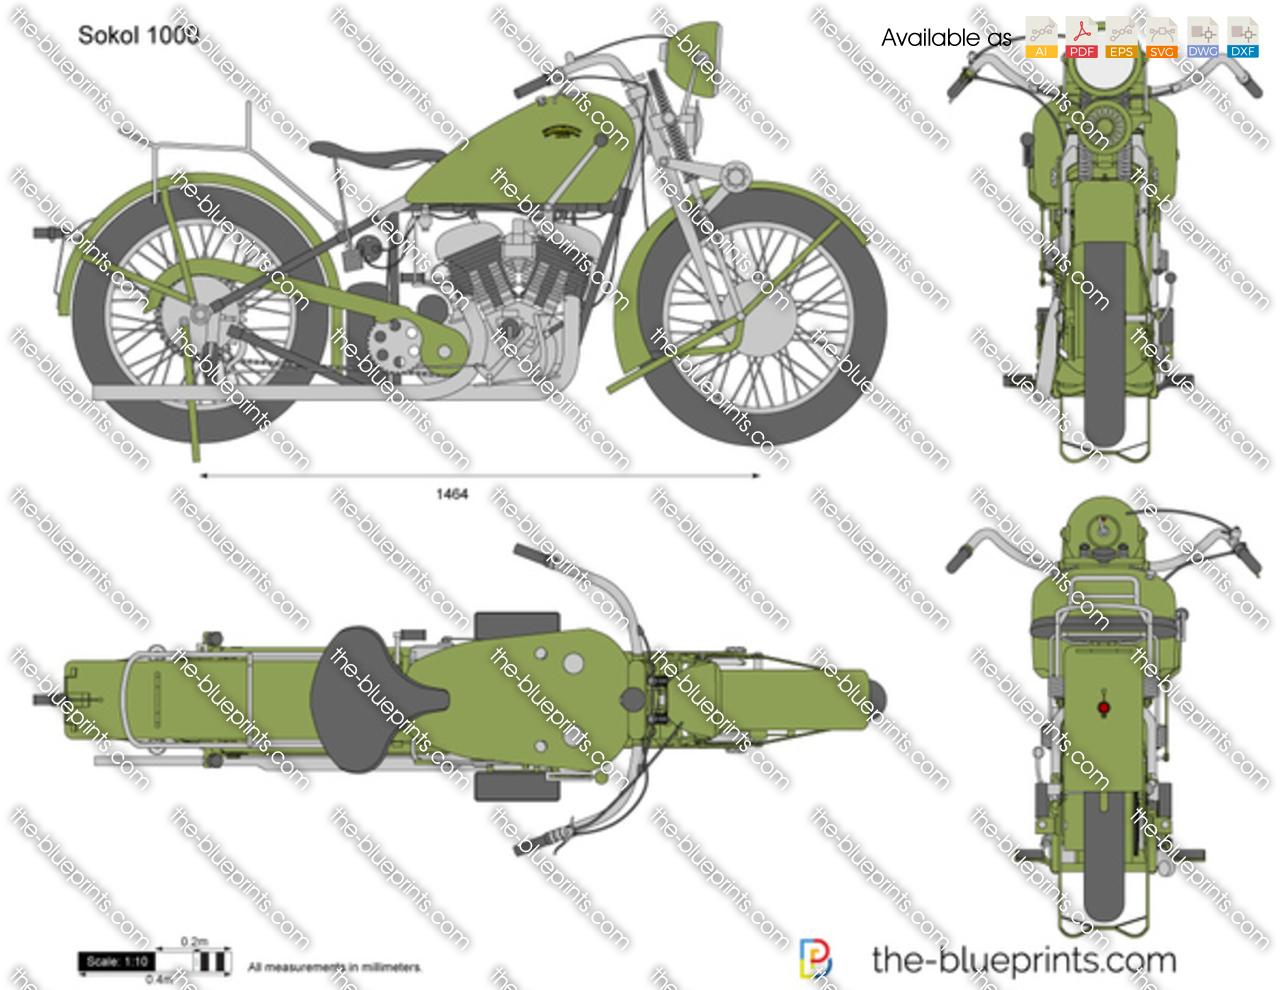 Sokol 1000 1933